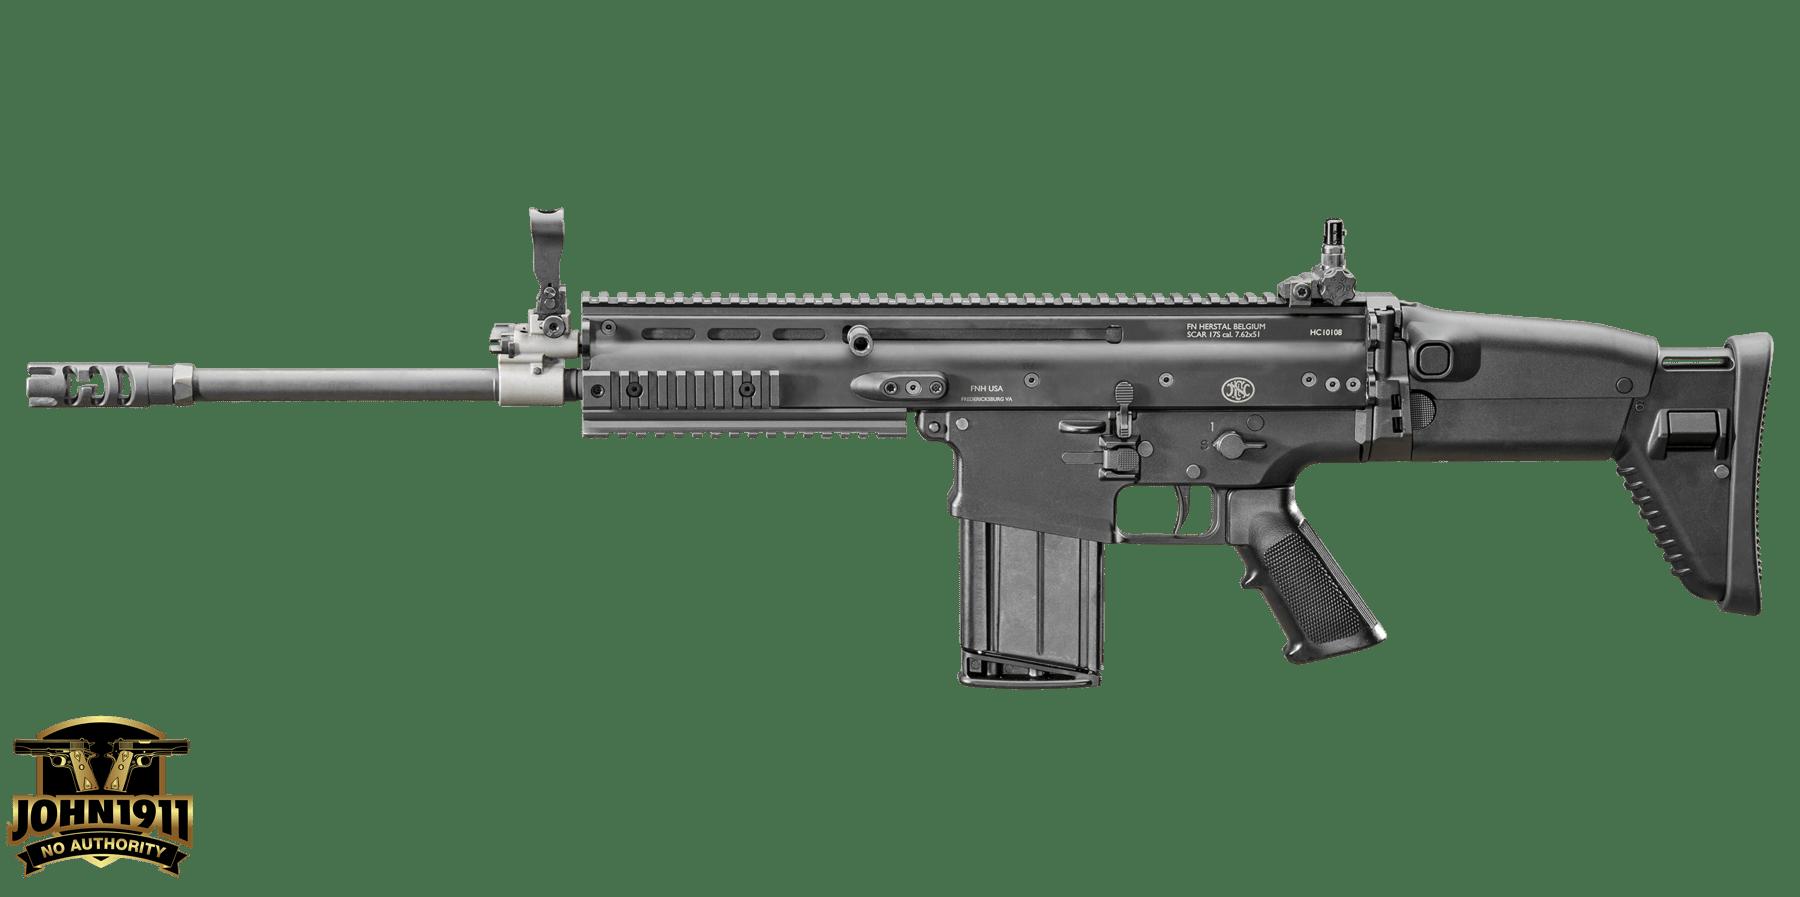 No. The Army Won't Go Back to 308 | John1911.com Gun Blog